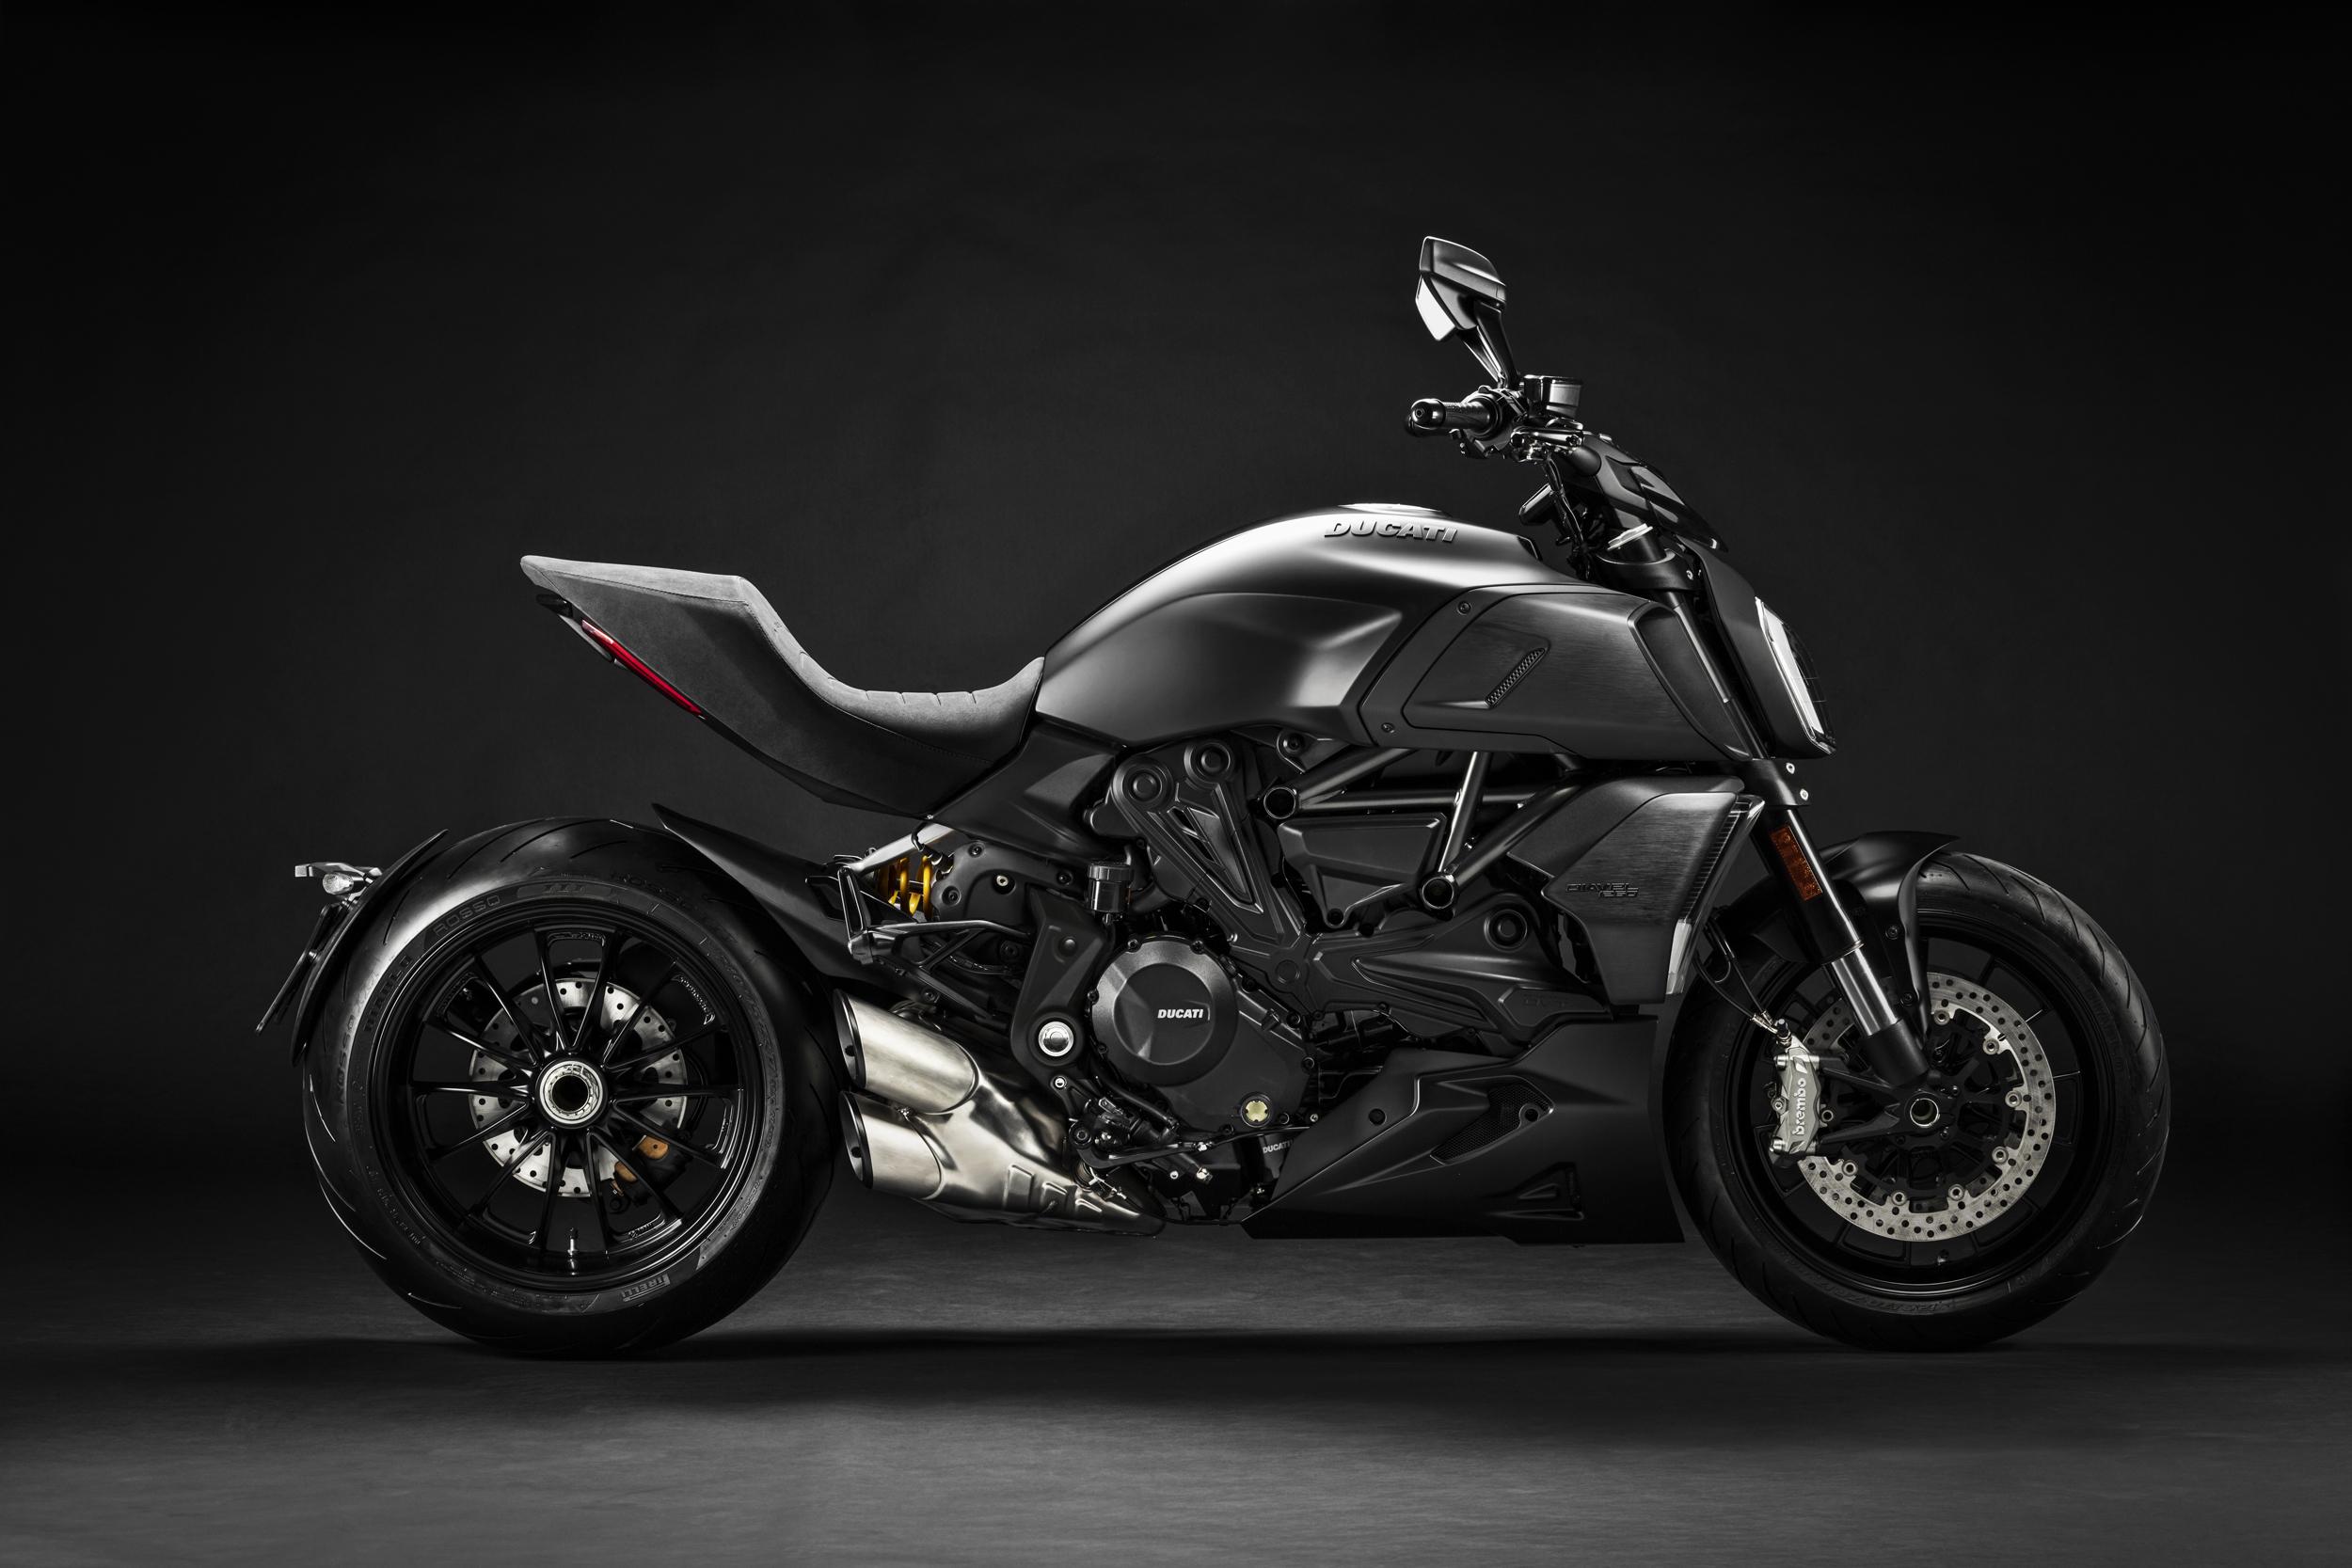 2020 Ducati Diavel 1260 [1]